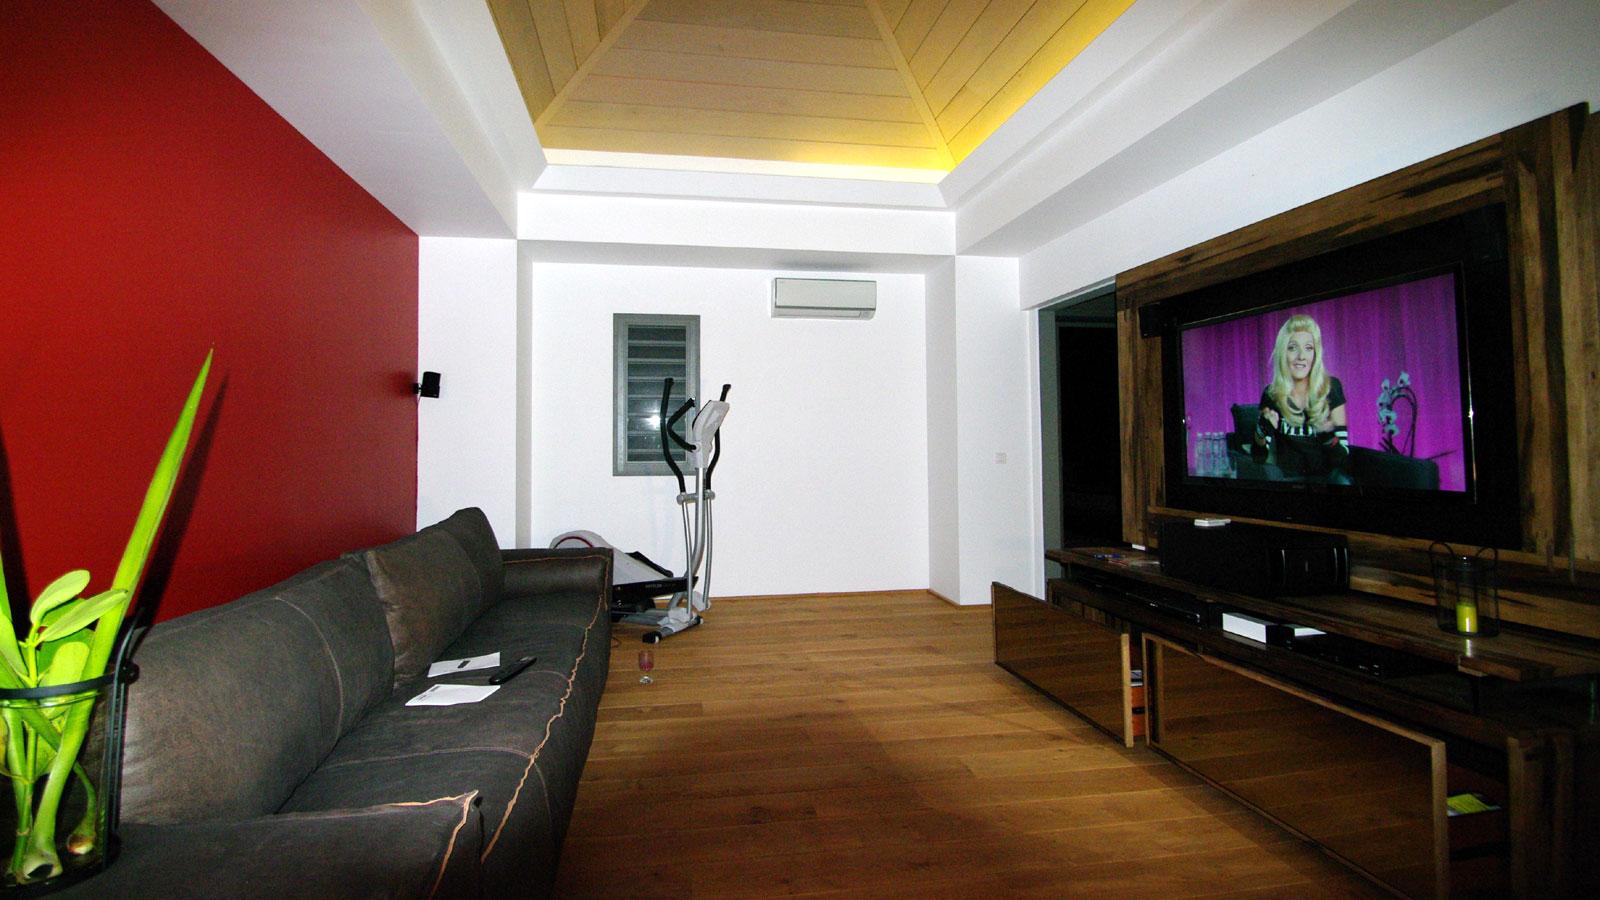 The media room (home cinema) of Green Lagoon, Petit Cul de Sac, St. Barths luxury holiday villa.